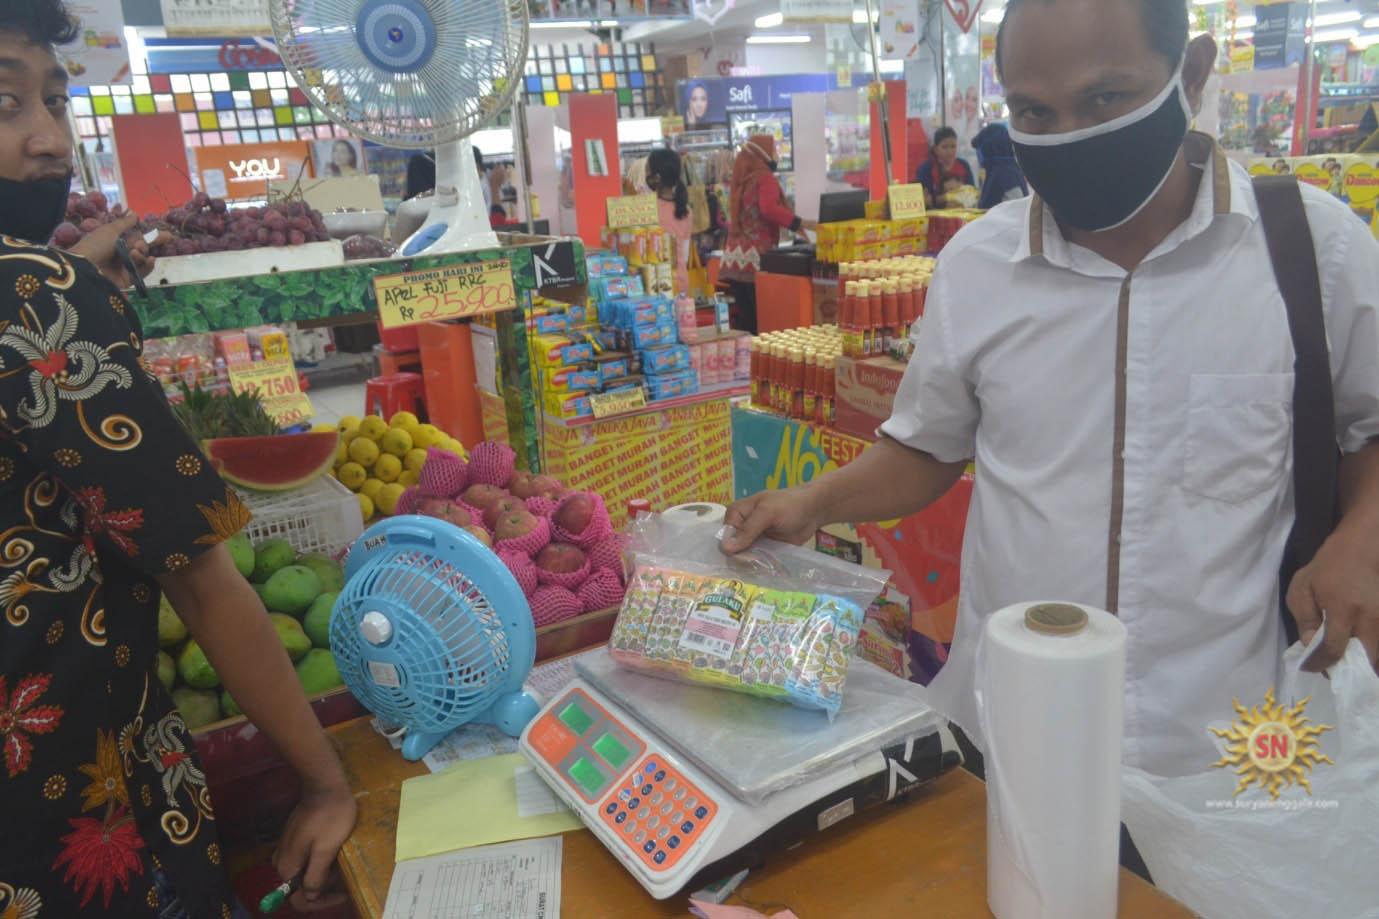 """Mengejutkan"" Swalayan Aneka Jaya Kendal Menjual Produk Tak Sesuai Label Dari Merk Gulaku Dan Merubah Kemasannya"